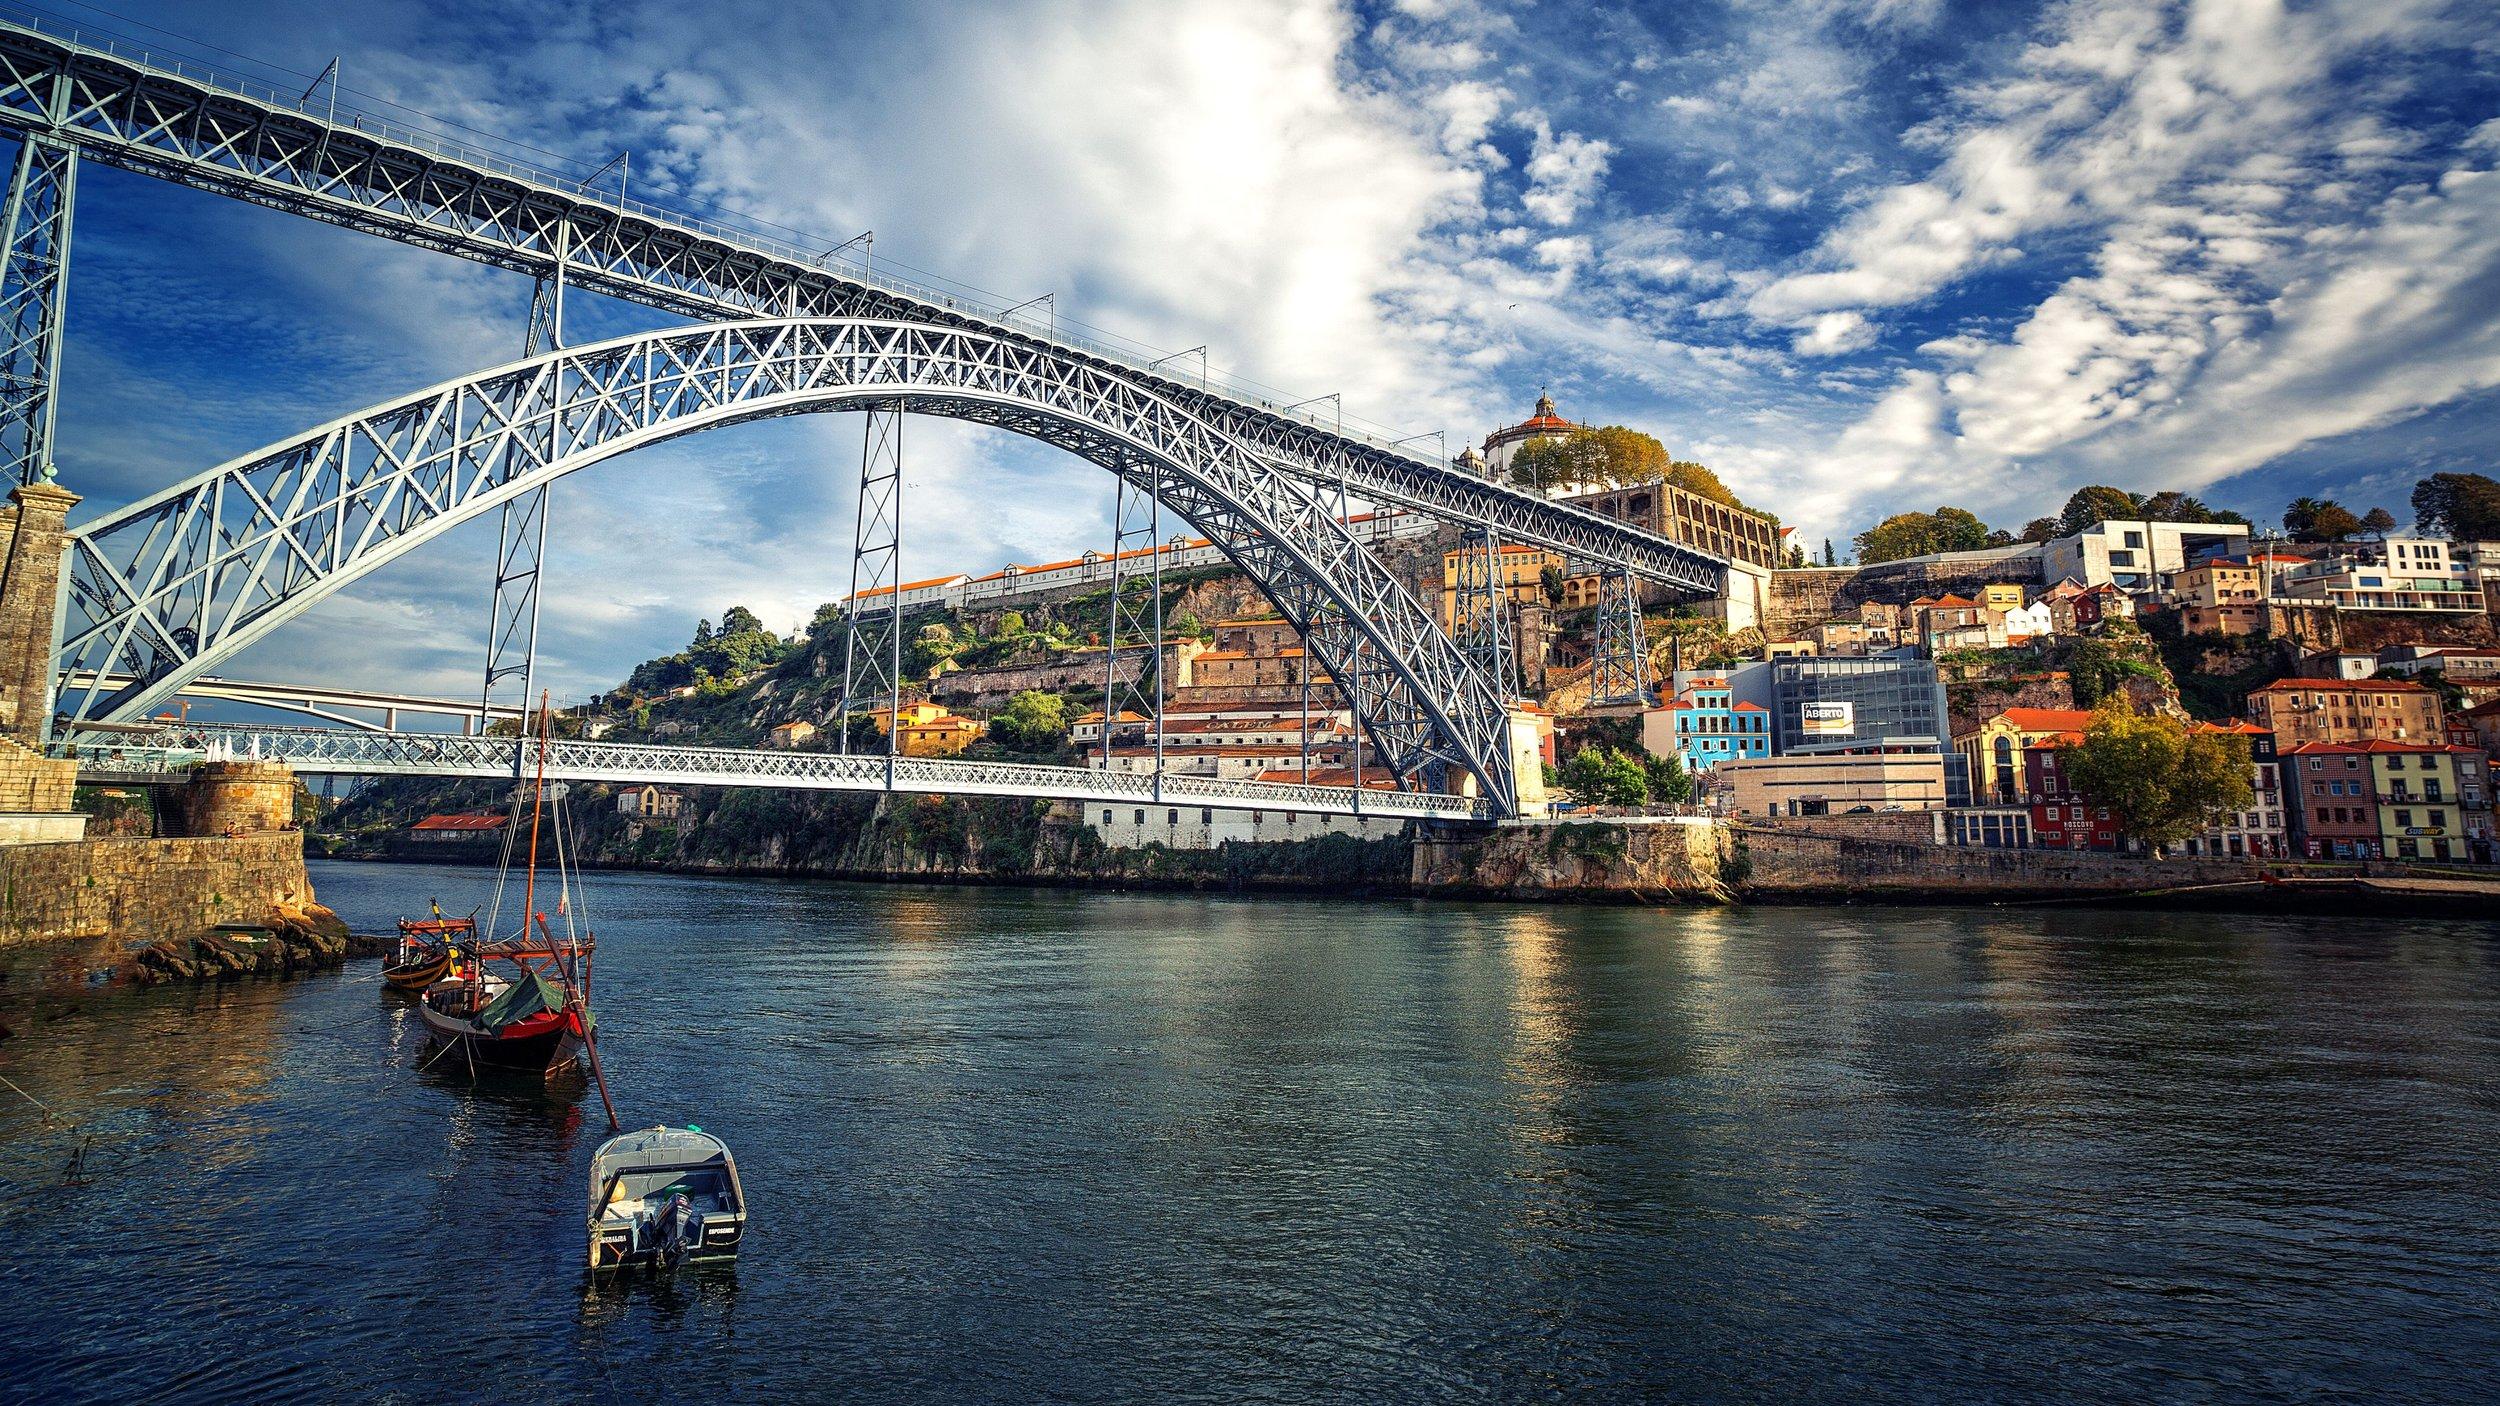 Passeios na Zona Turística de Porto e Vila Nova de Gaia - Cruzeiro de 1 hora (